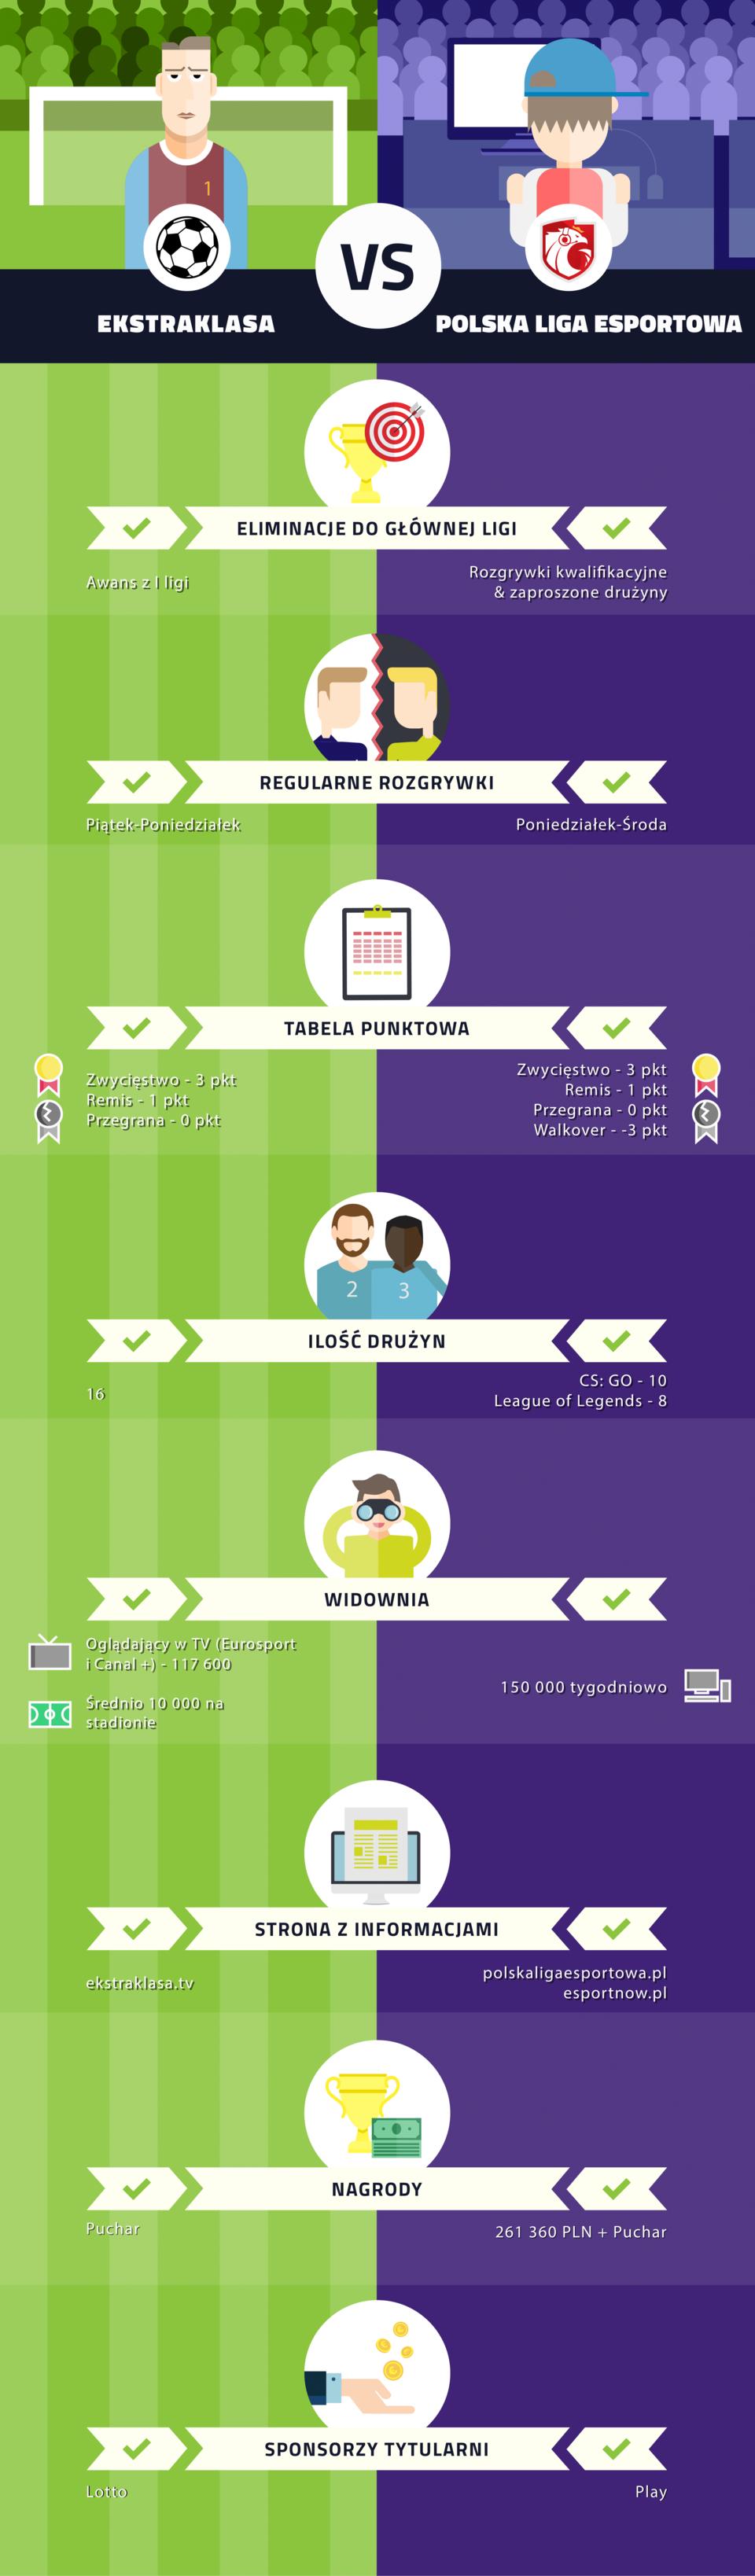 Ekstraklasa_vs_PLE_infografika.png